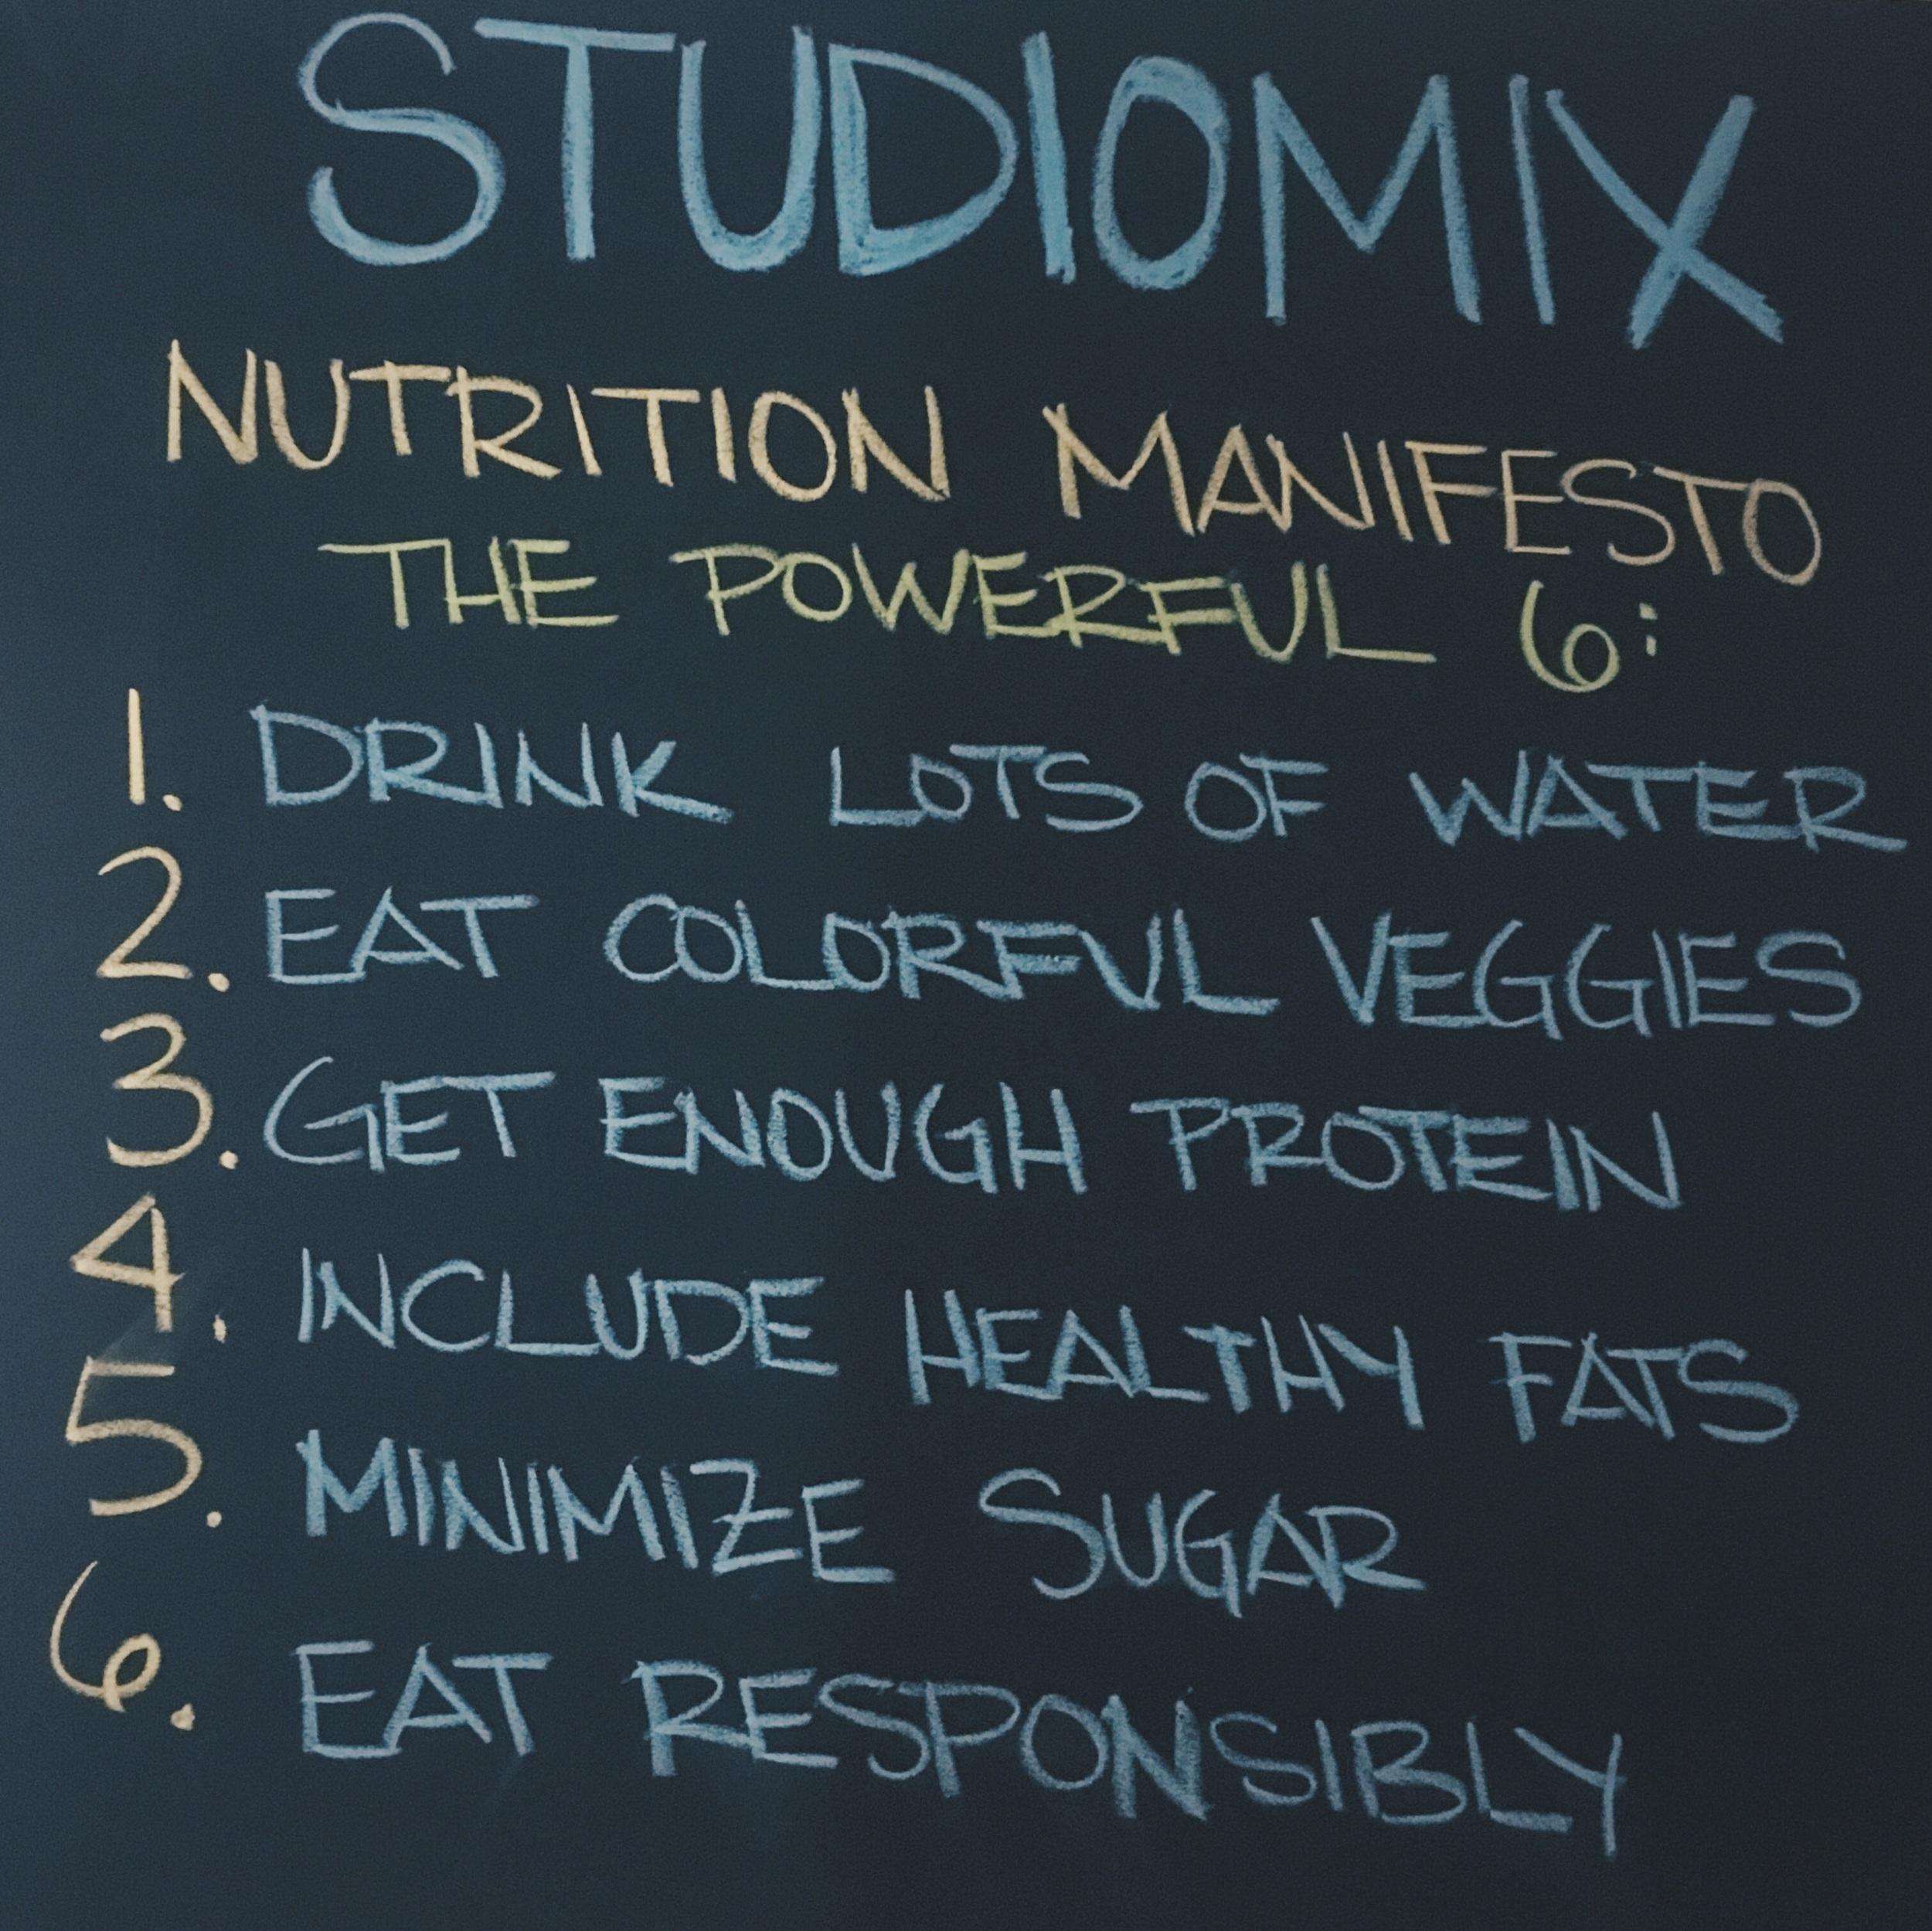 The Studiomix Nutrition Manifesto